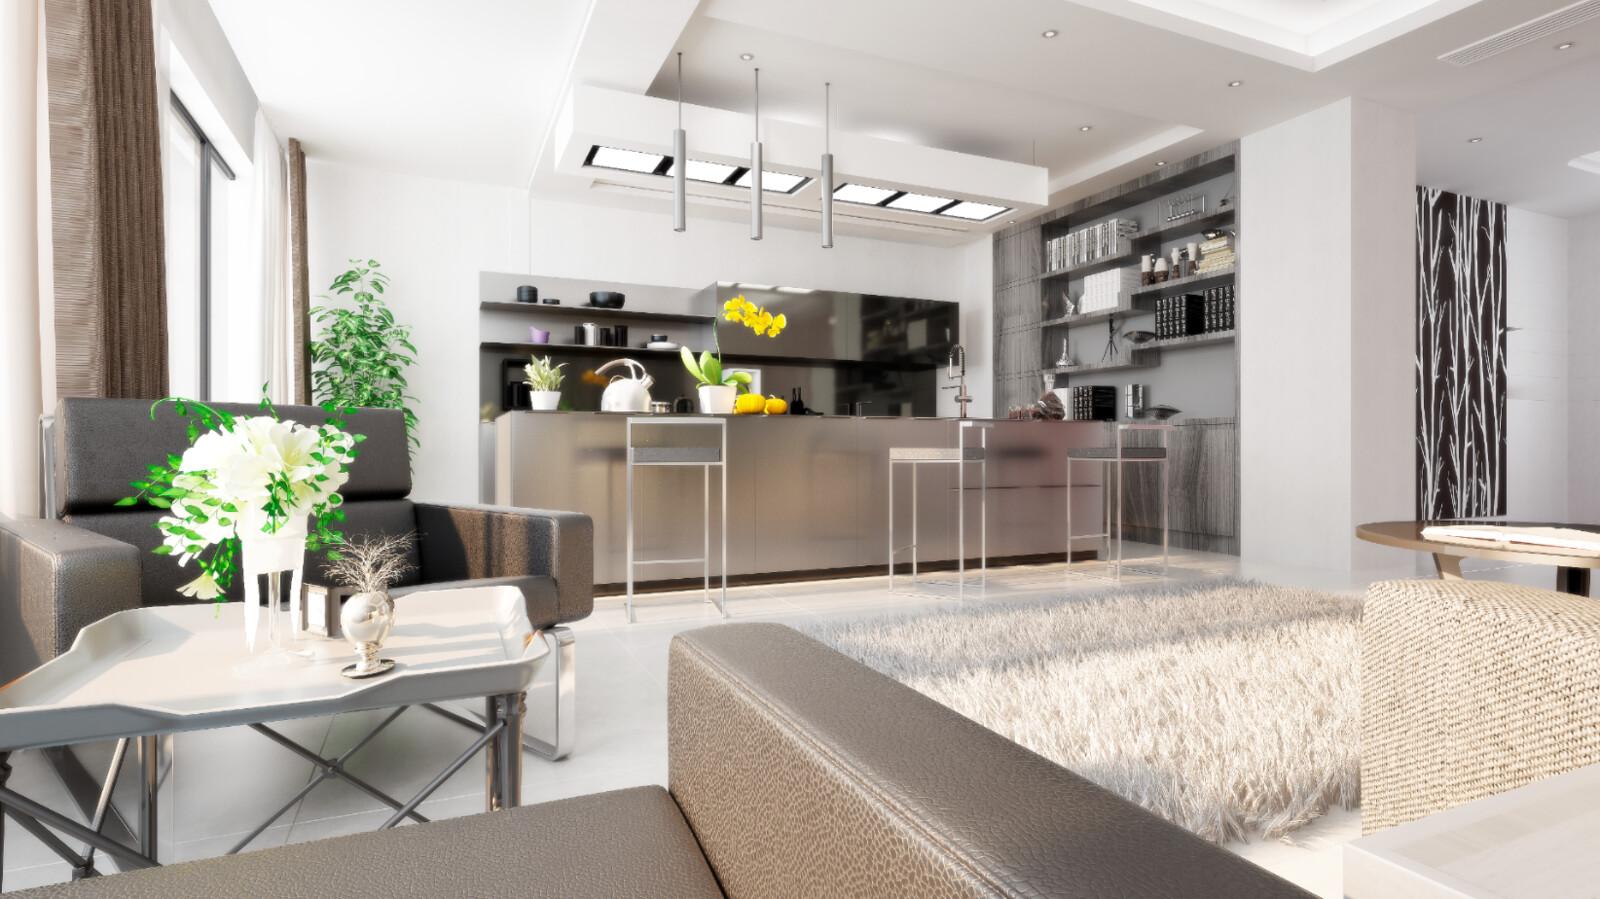 Interior design other render perspective